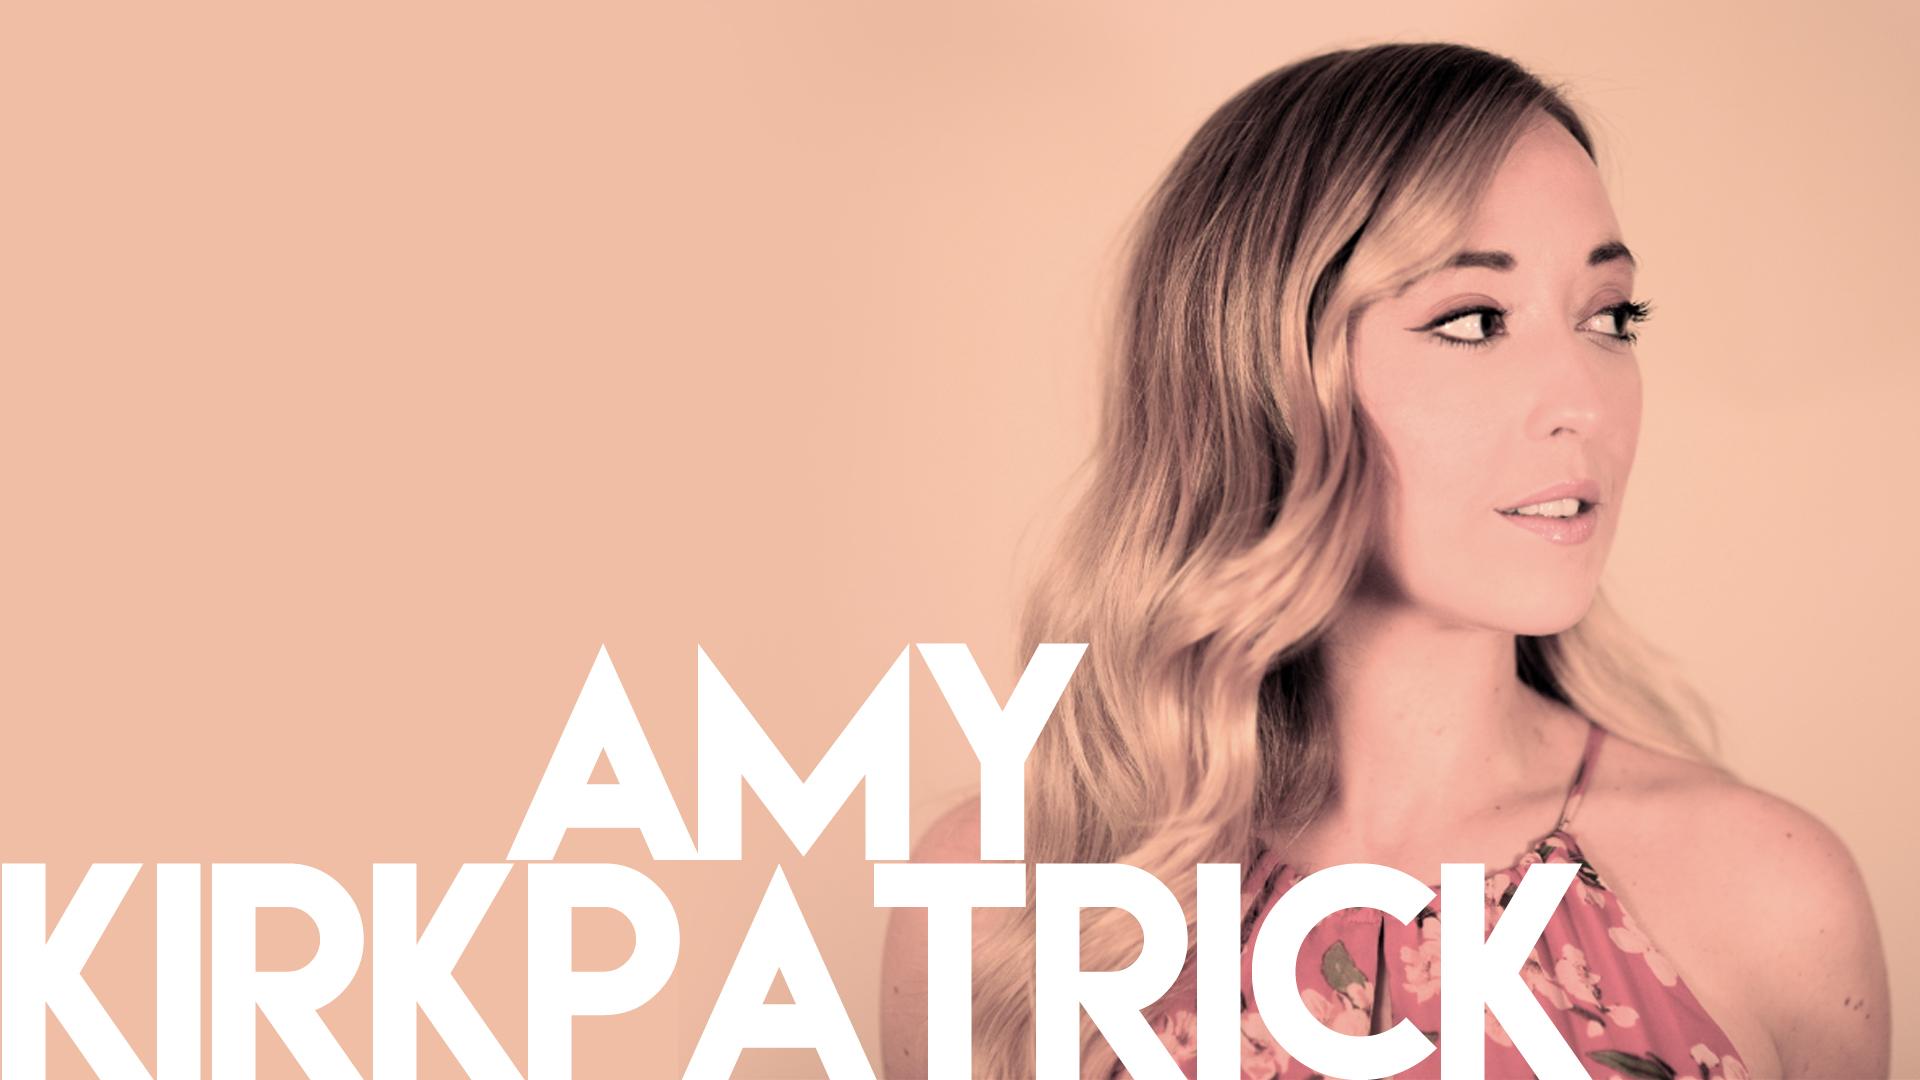 Amy kirkpatrick 2